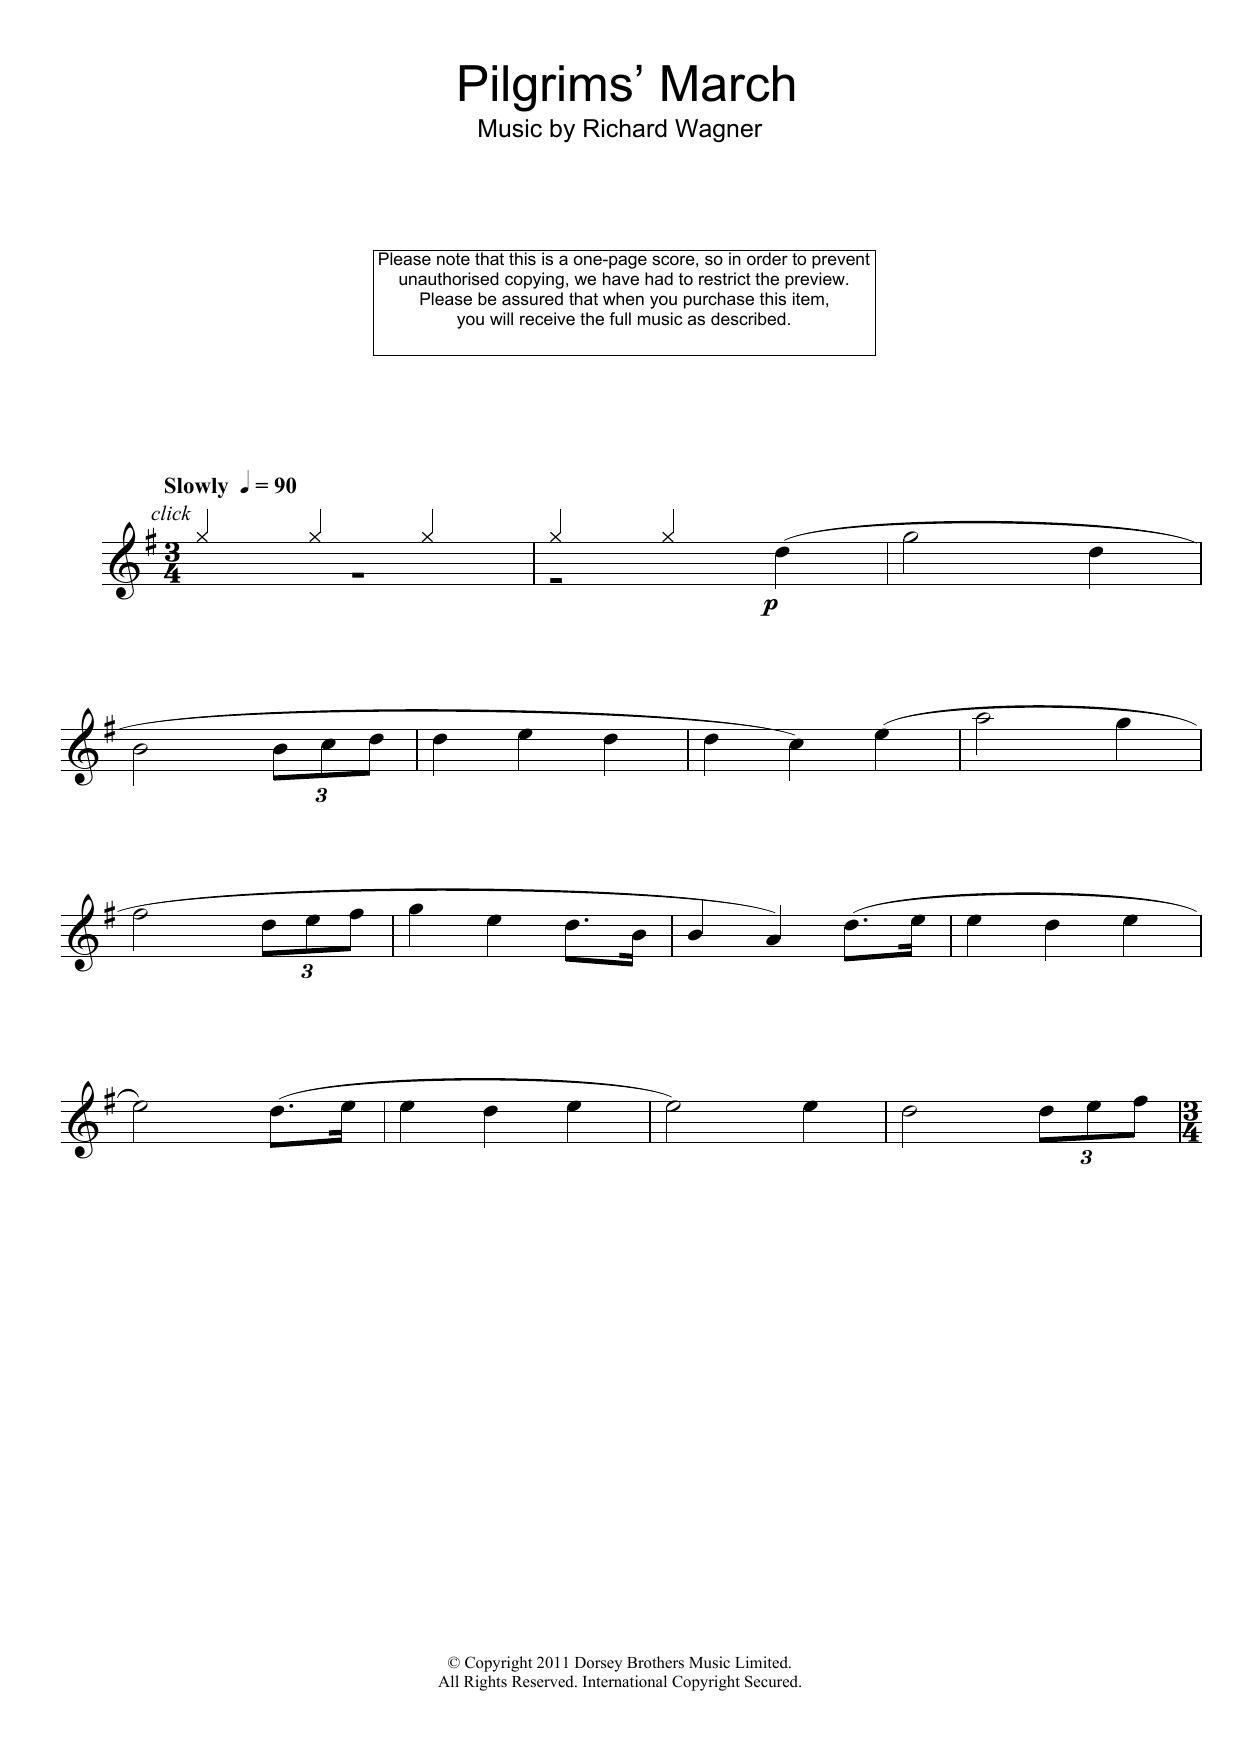 Richard Wagner - Pilgrims' March